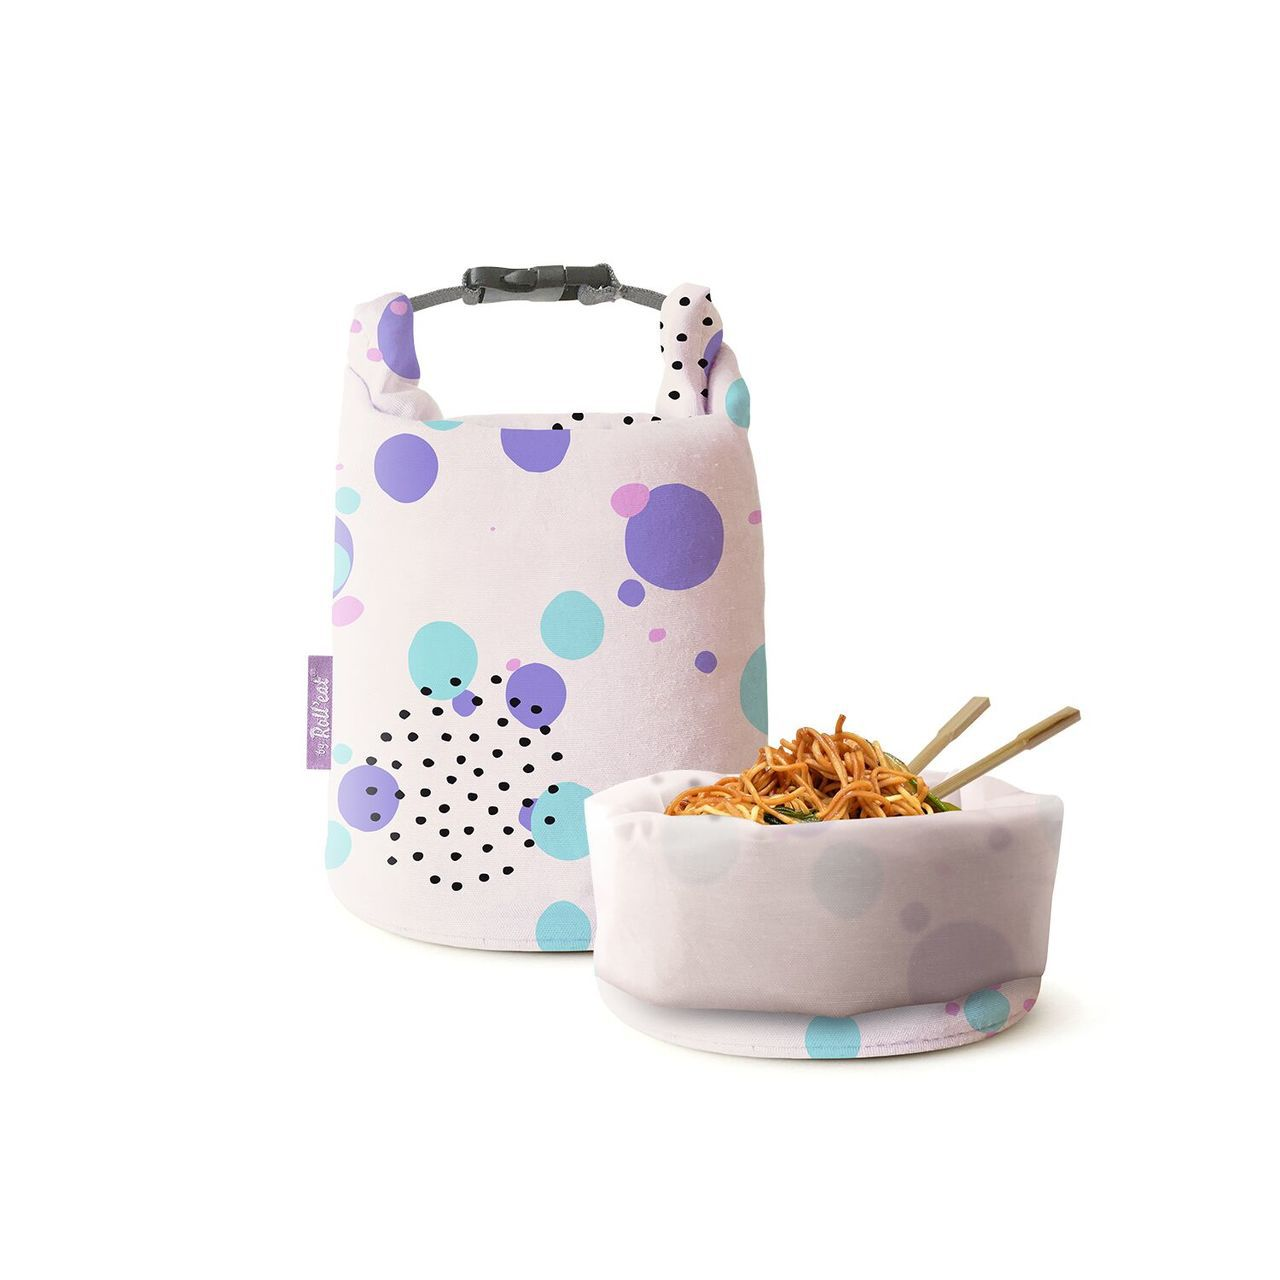 Roll'eat Eco Wrap環保食物袋Grab'n Go可盛裝熱食,售價5...